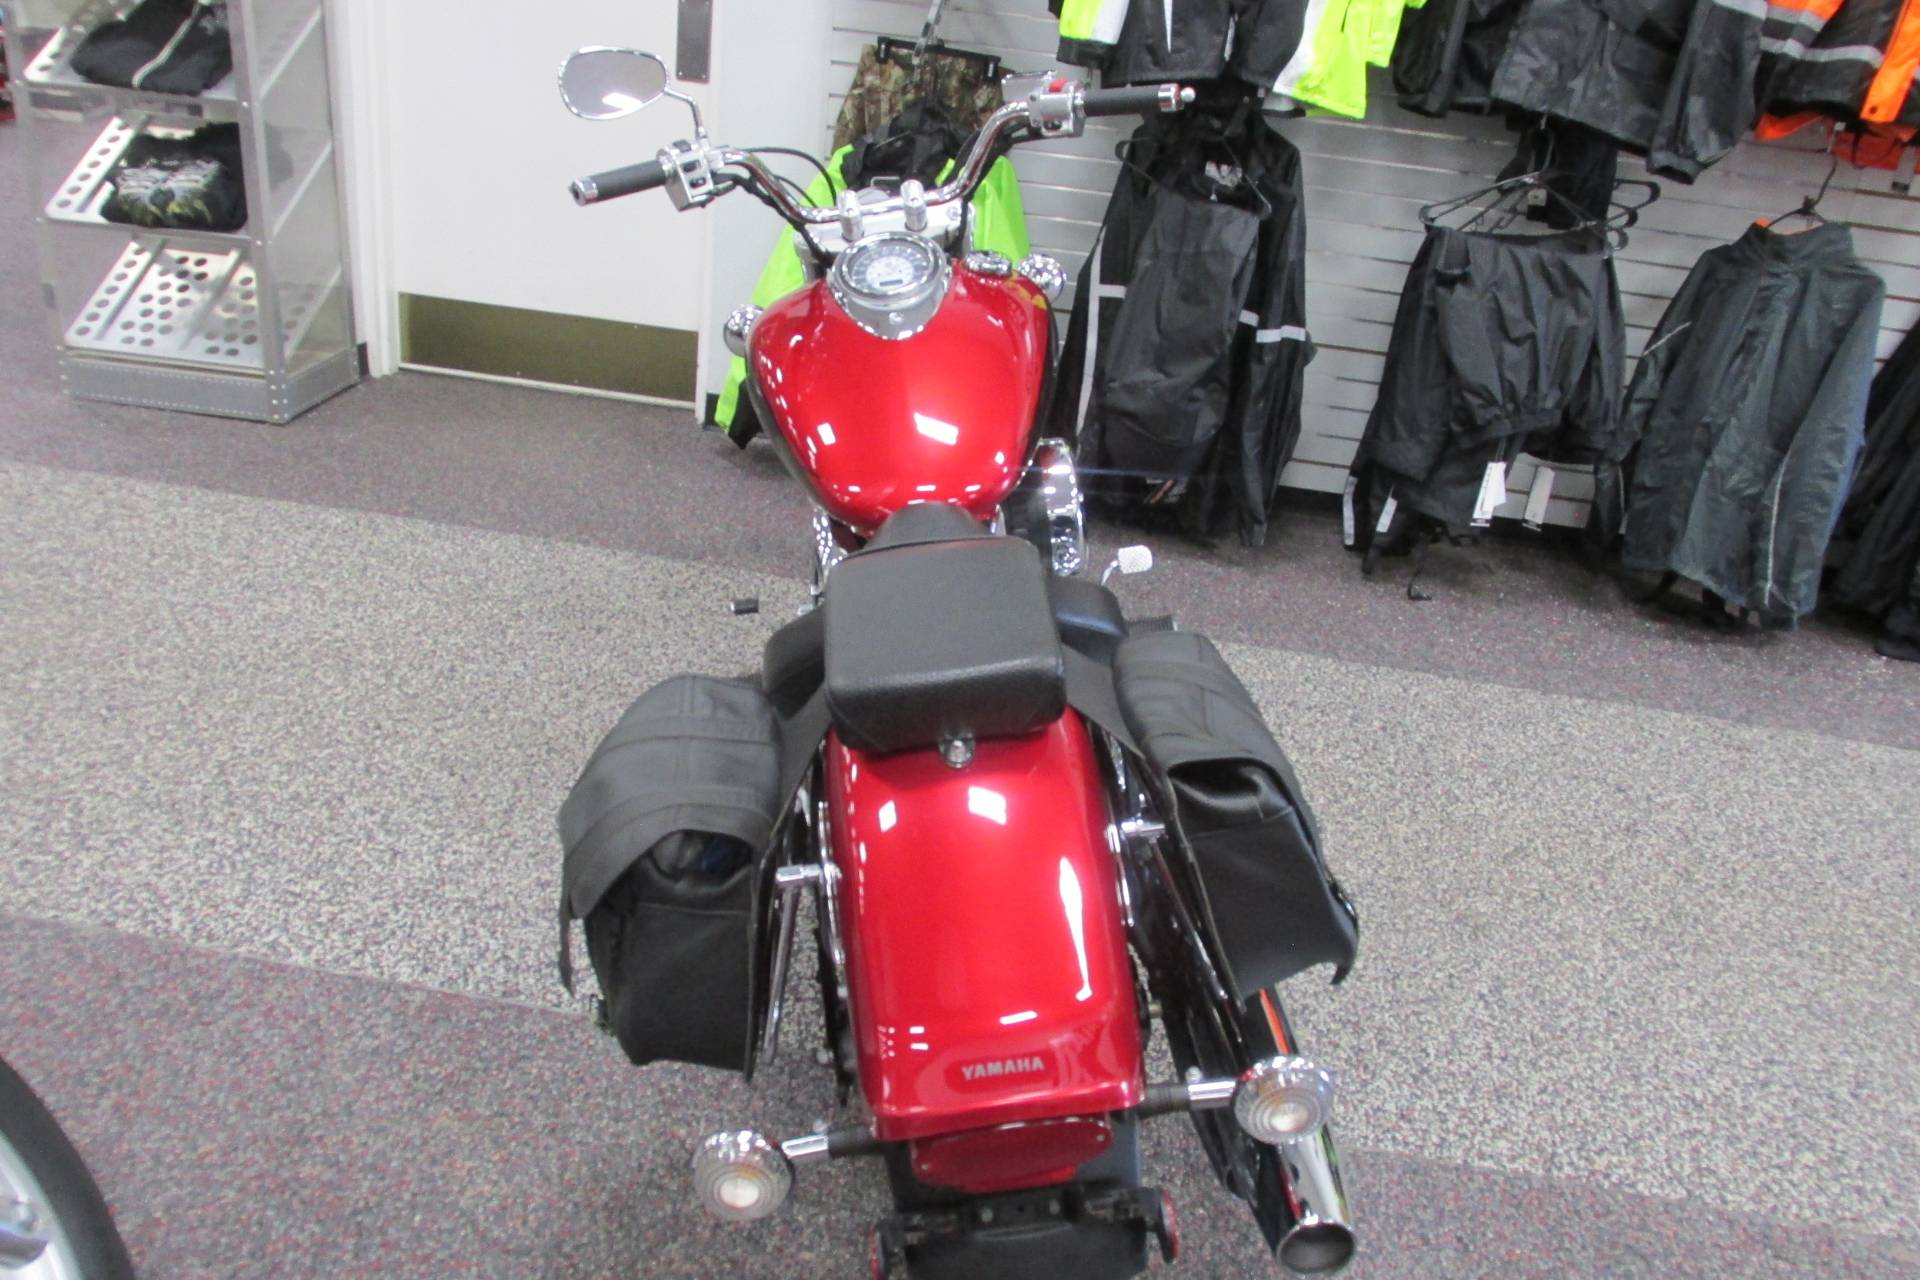 2009 Yamaha VSTAR 1100 CLASSIC 6